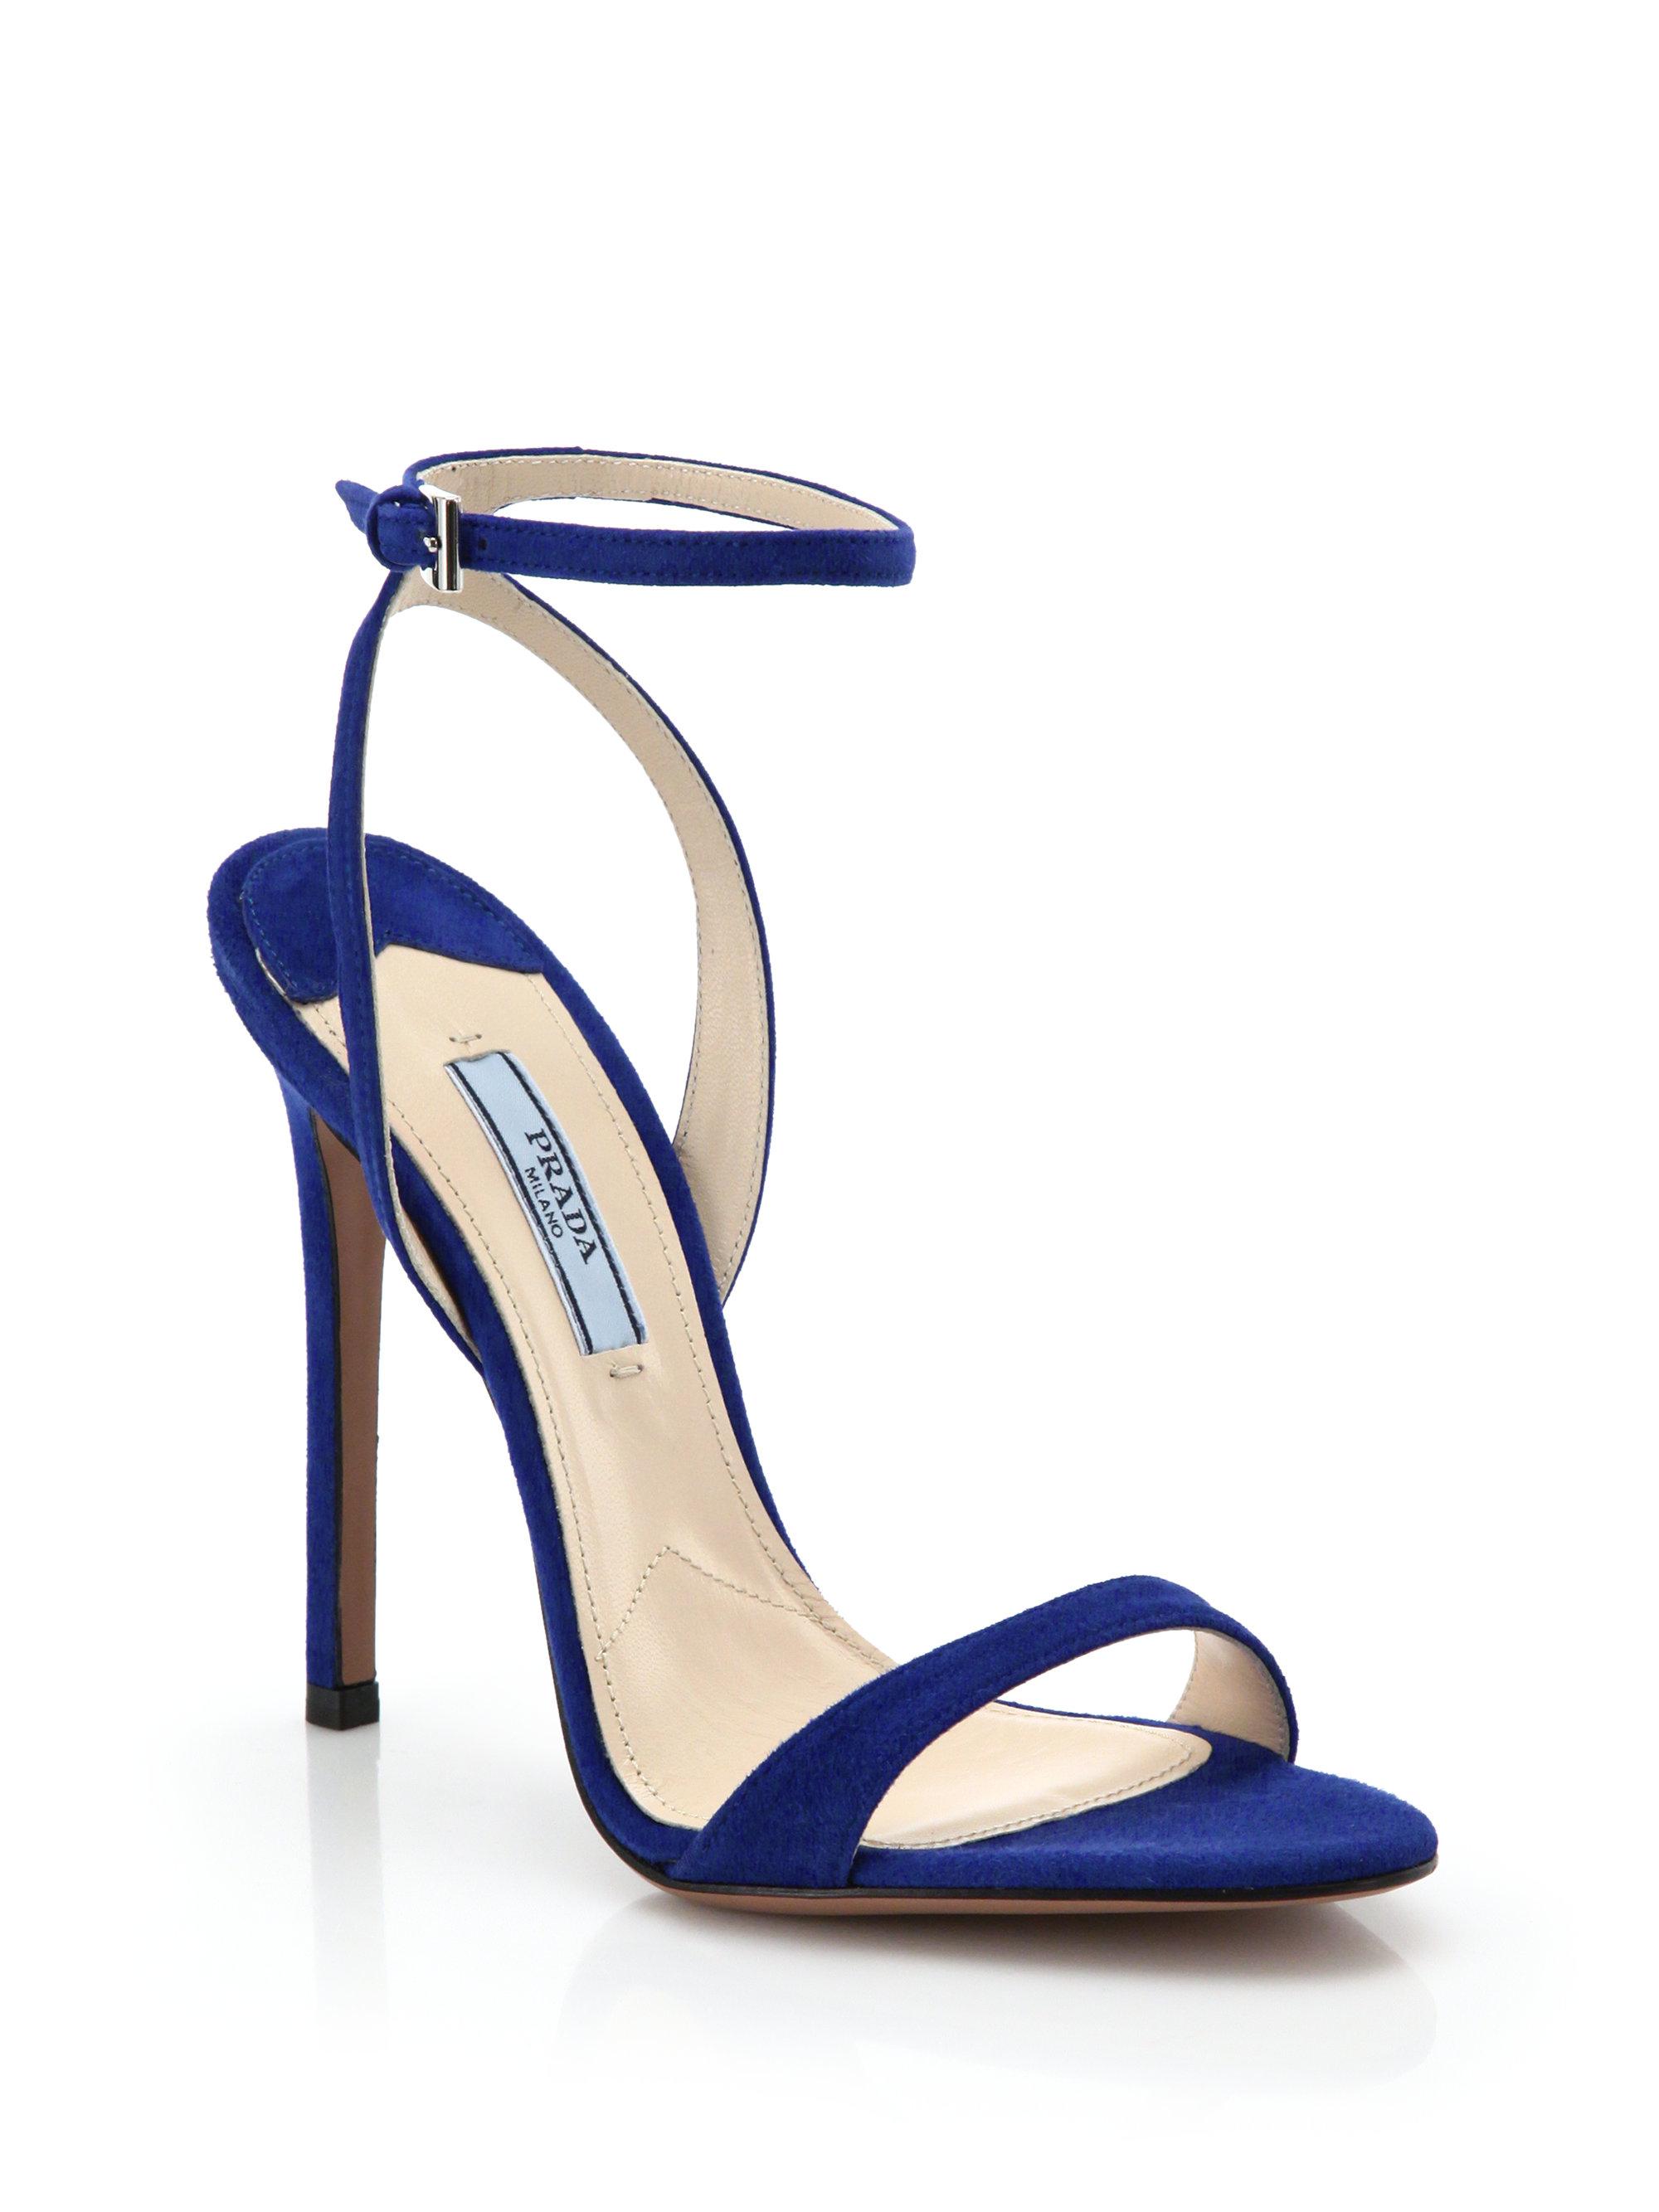 Prada Suede Sandals in Blue - Lyst